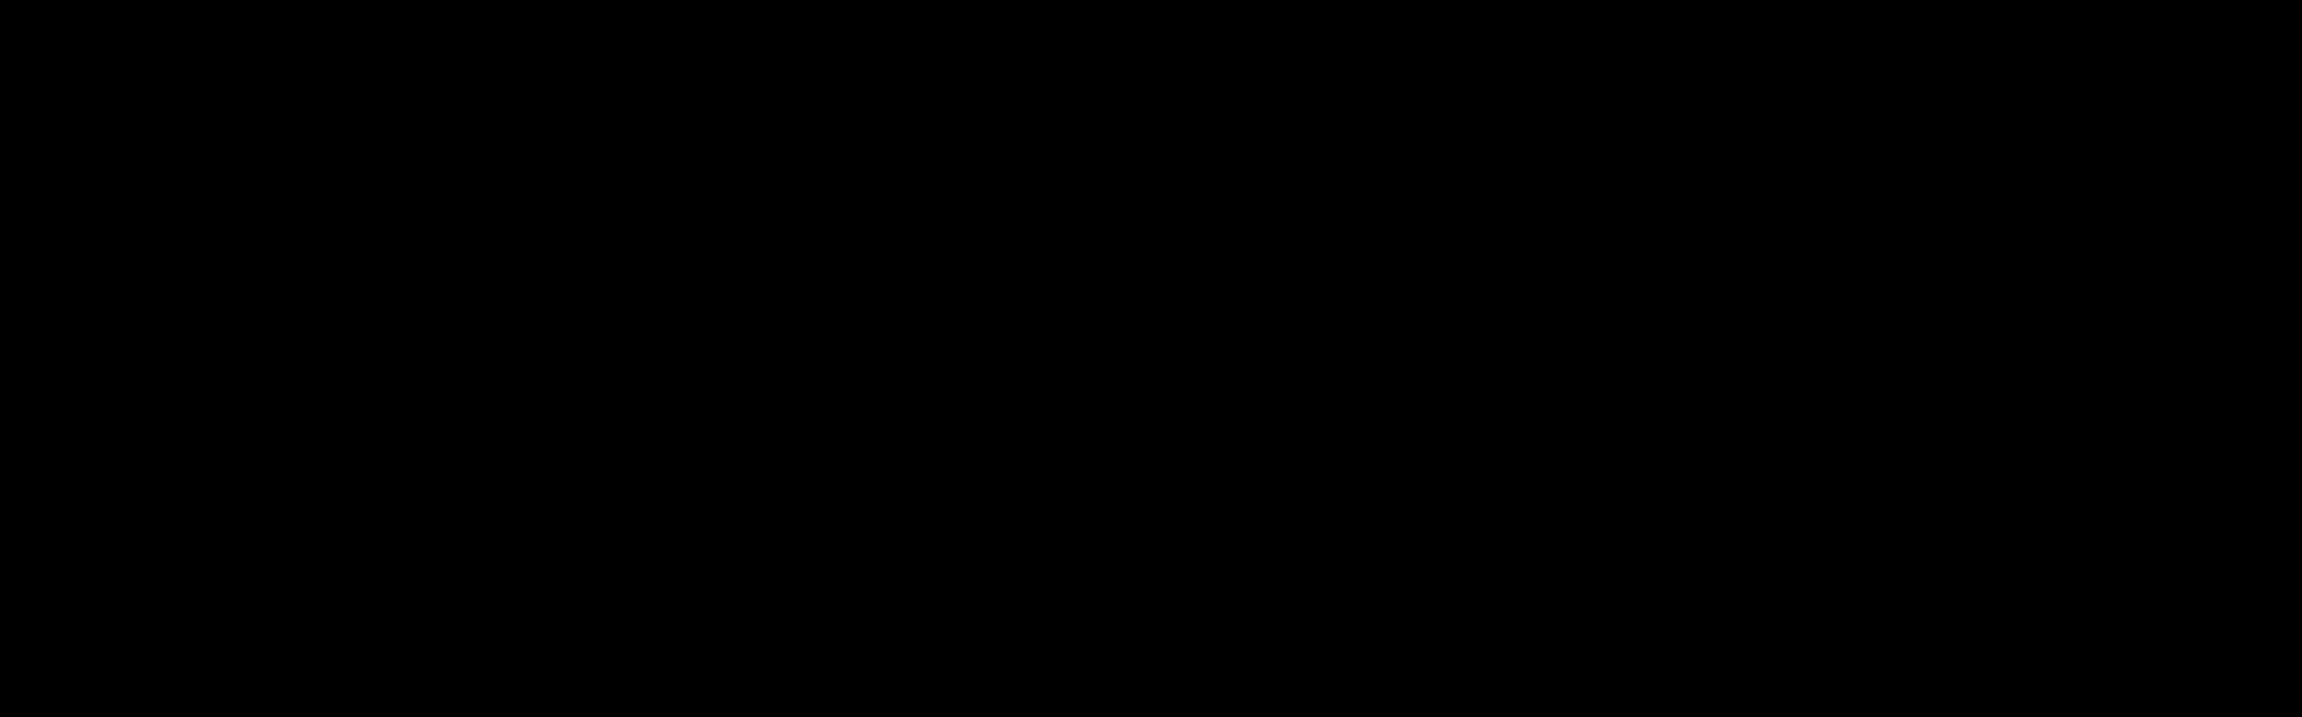 Dehydro aripiprazole hydrochloride